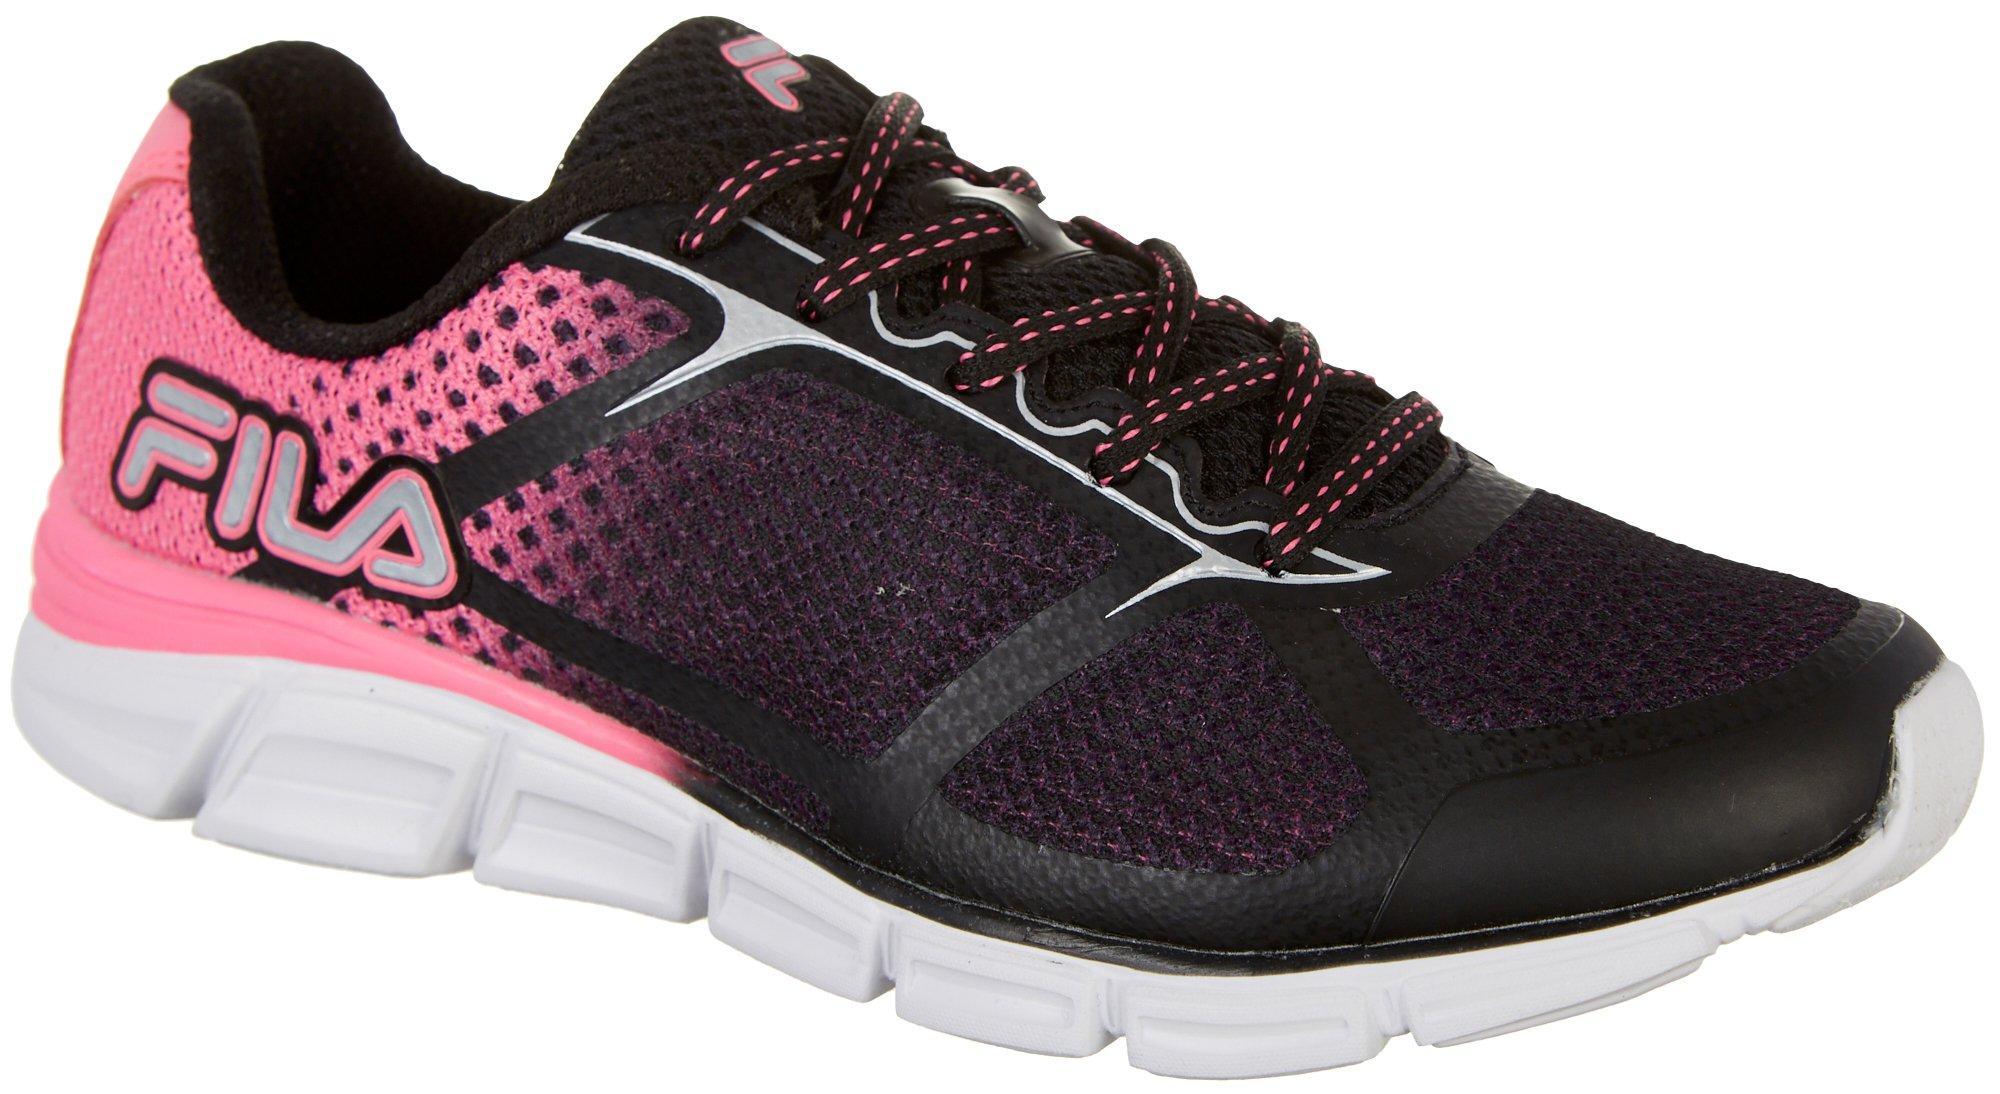 Fila Womens Memory Outreach Running Shoes Bealls Florida  Bealls Florida